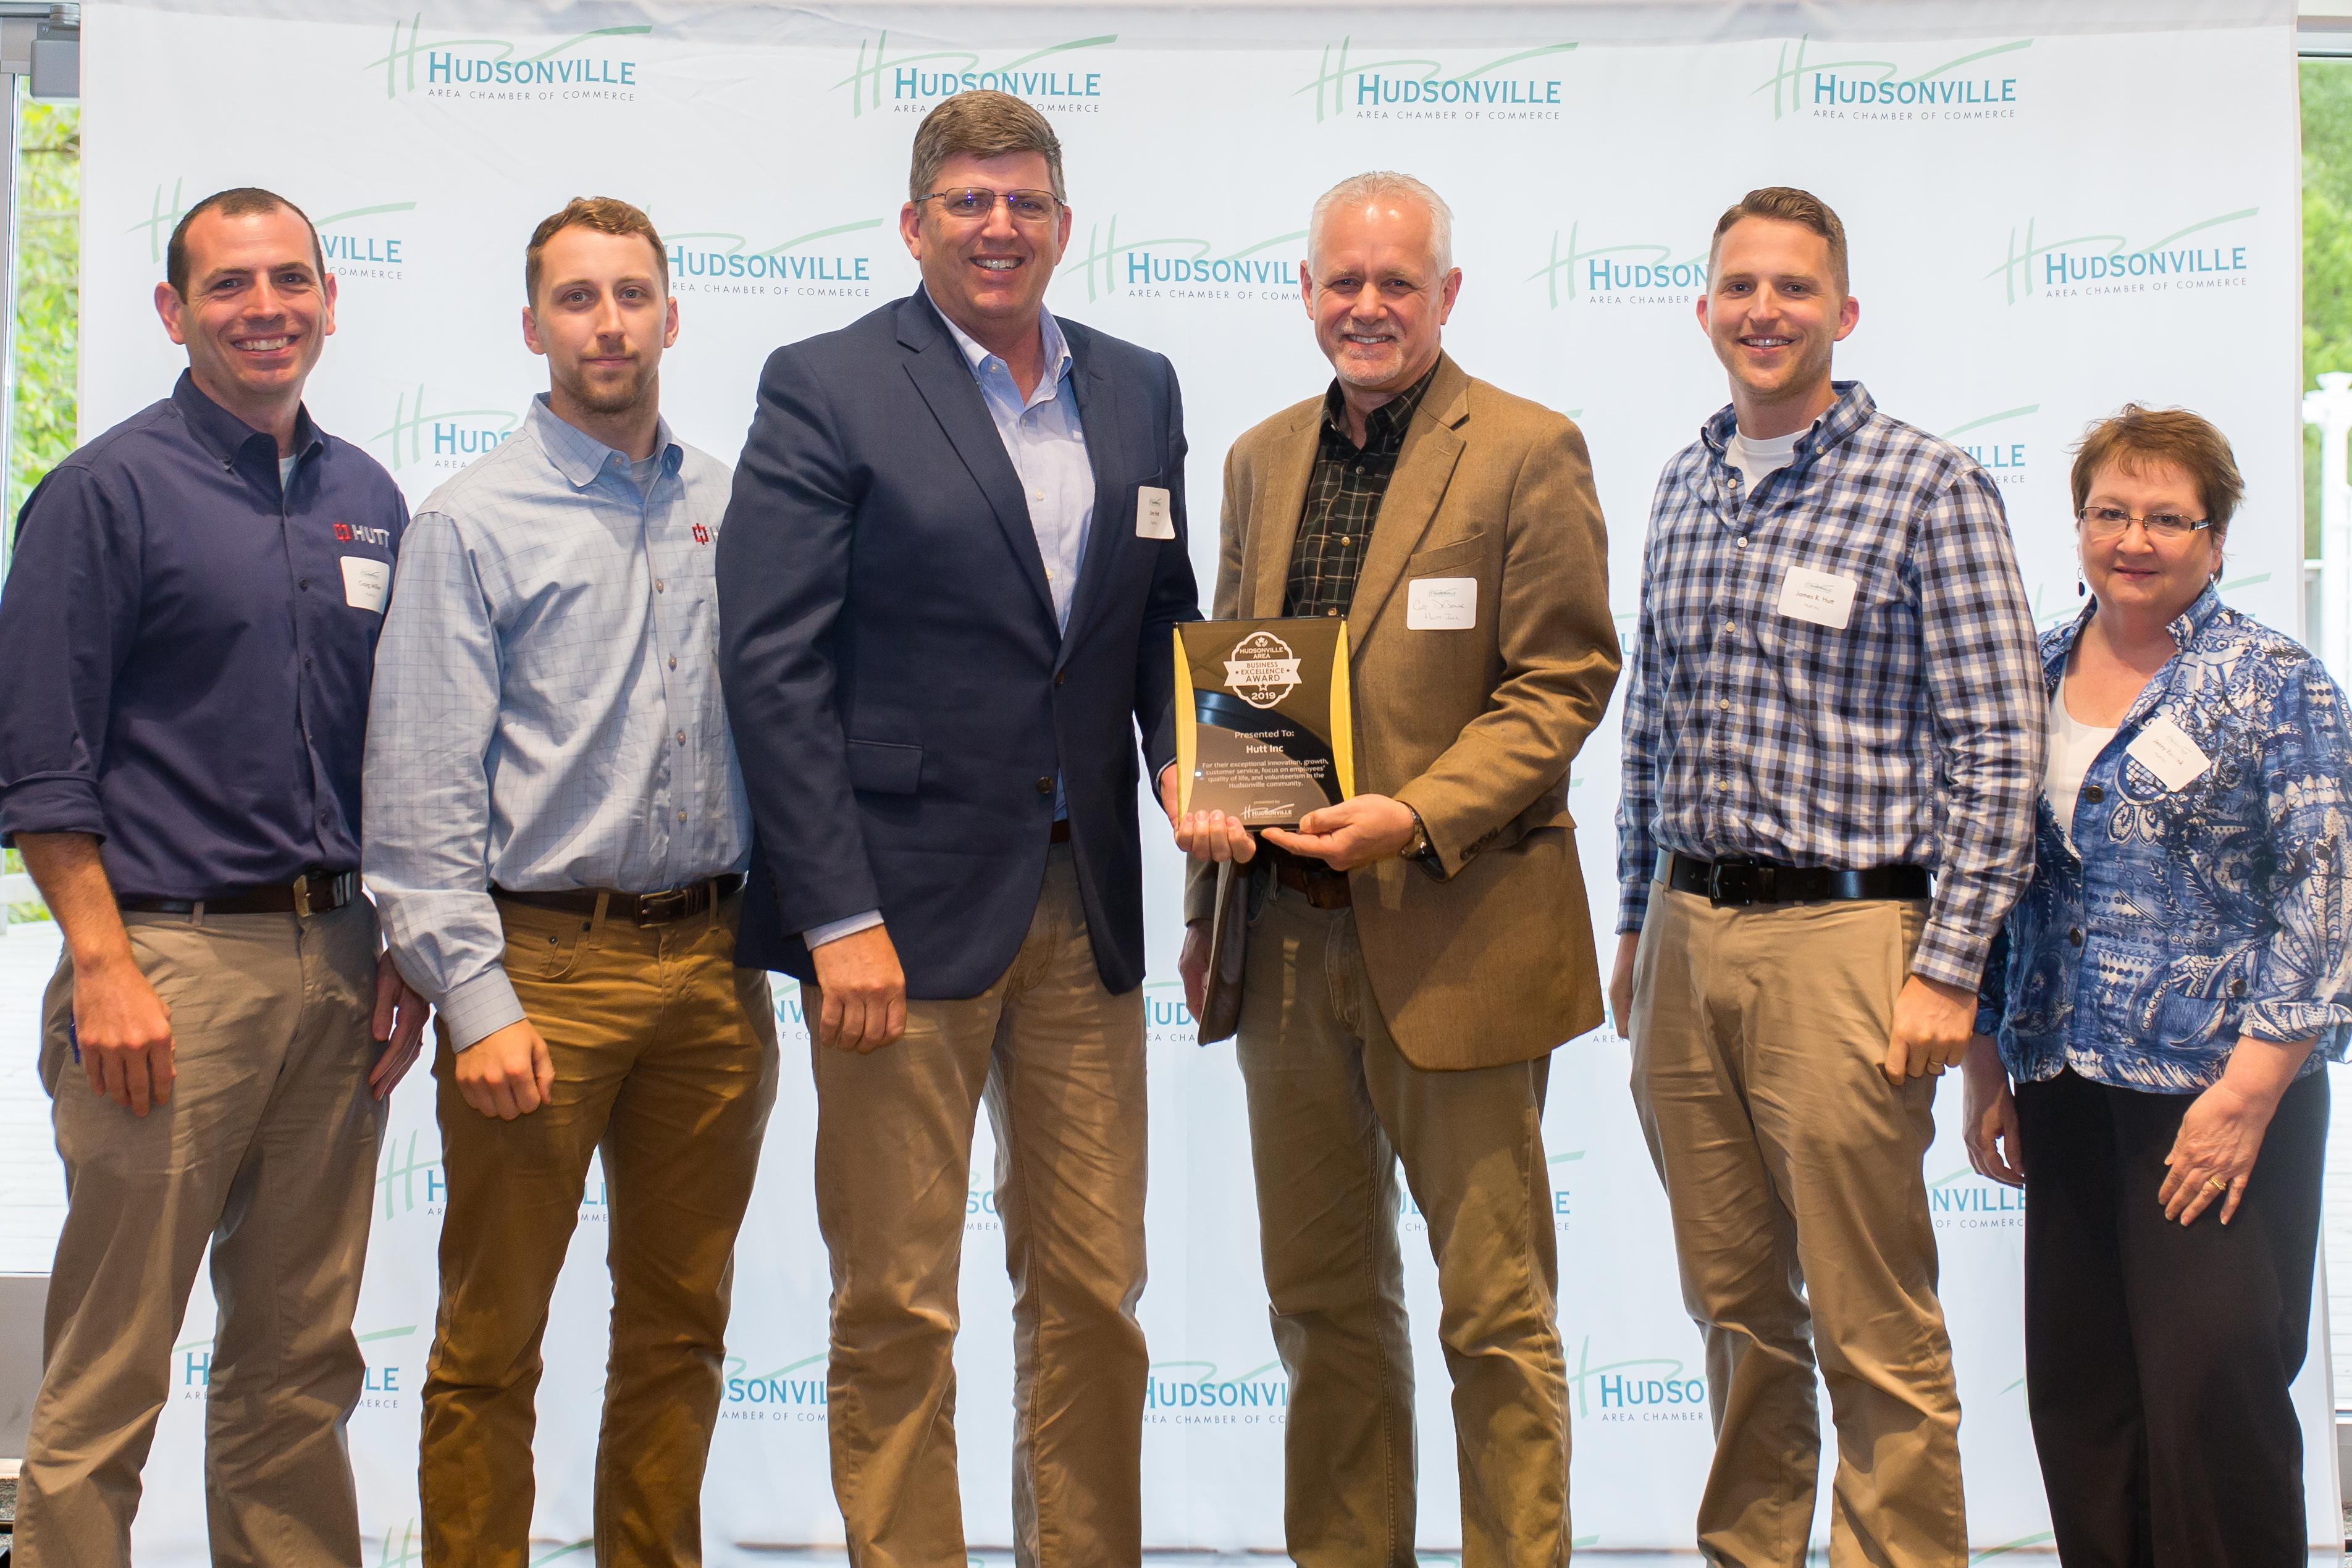 Hudsonville Area Business Excellence Award 2019 - Hutt Inc